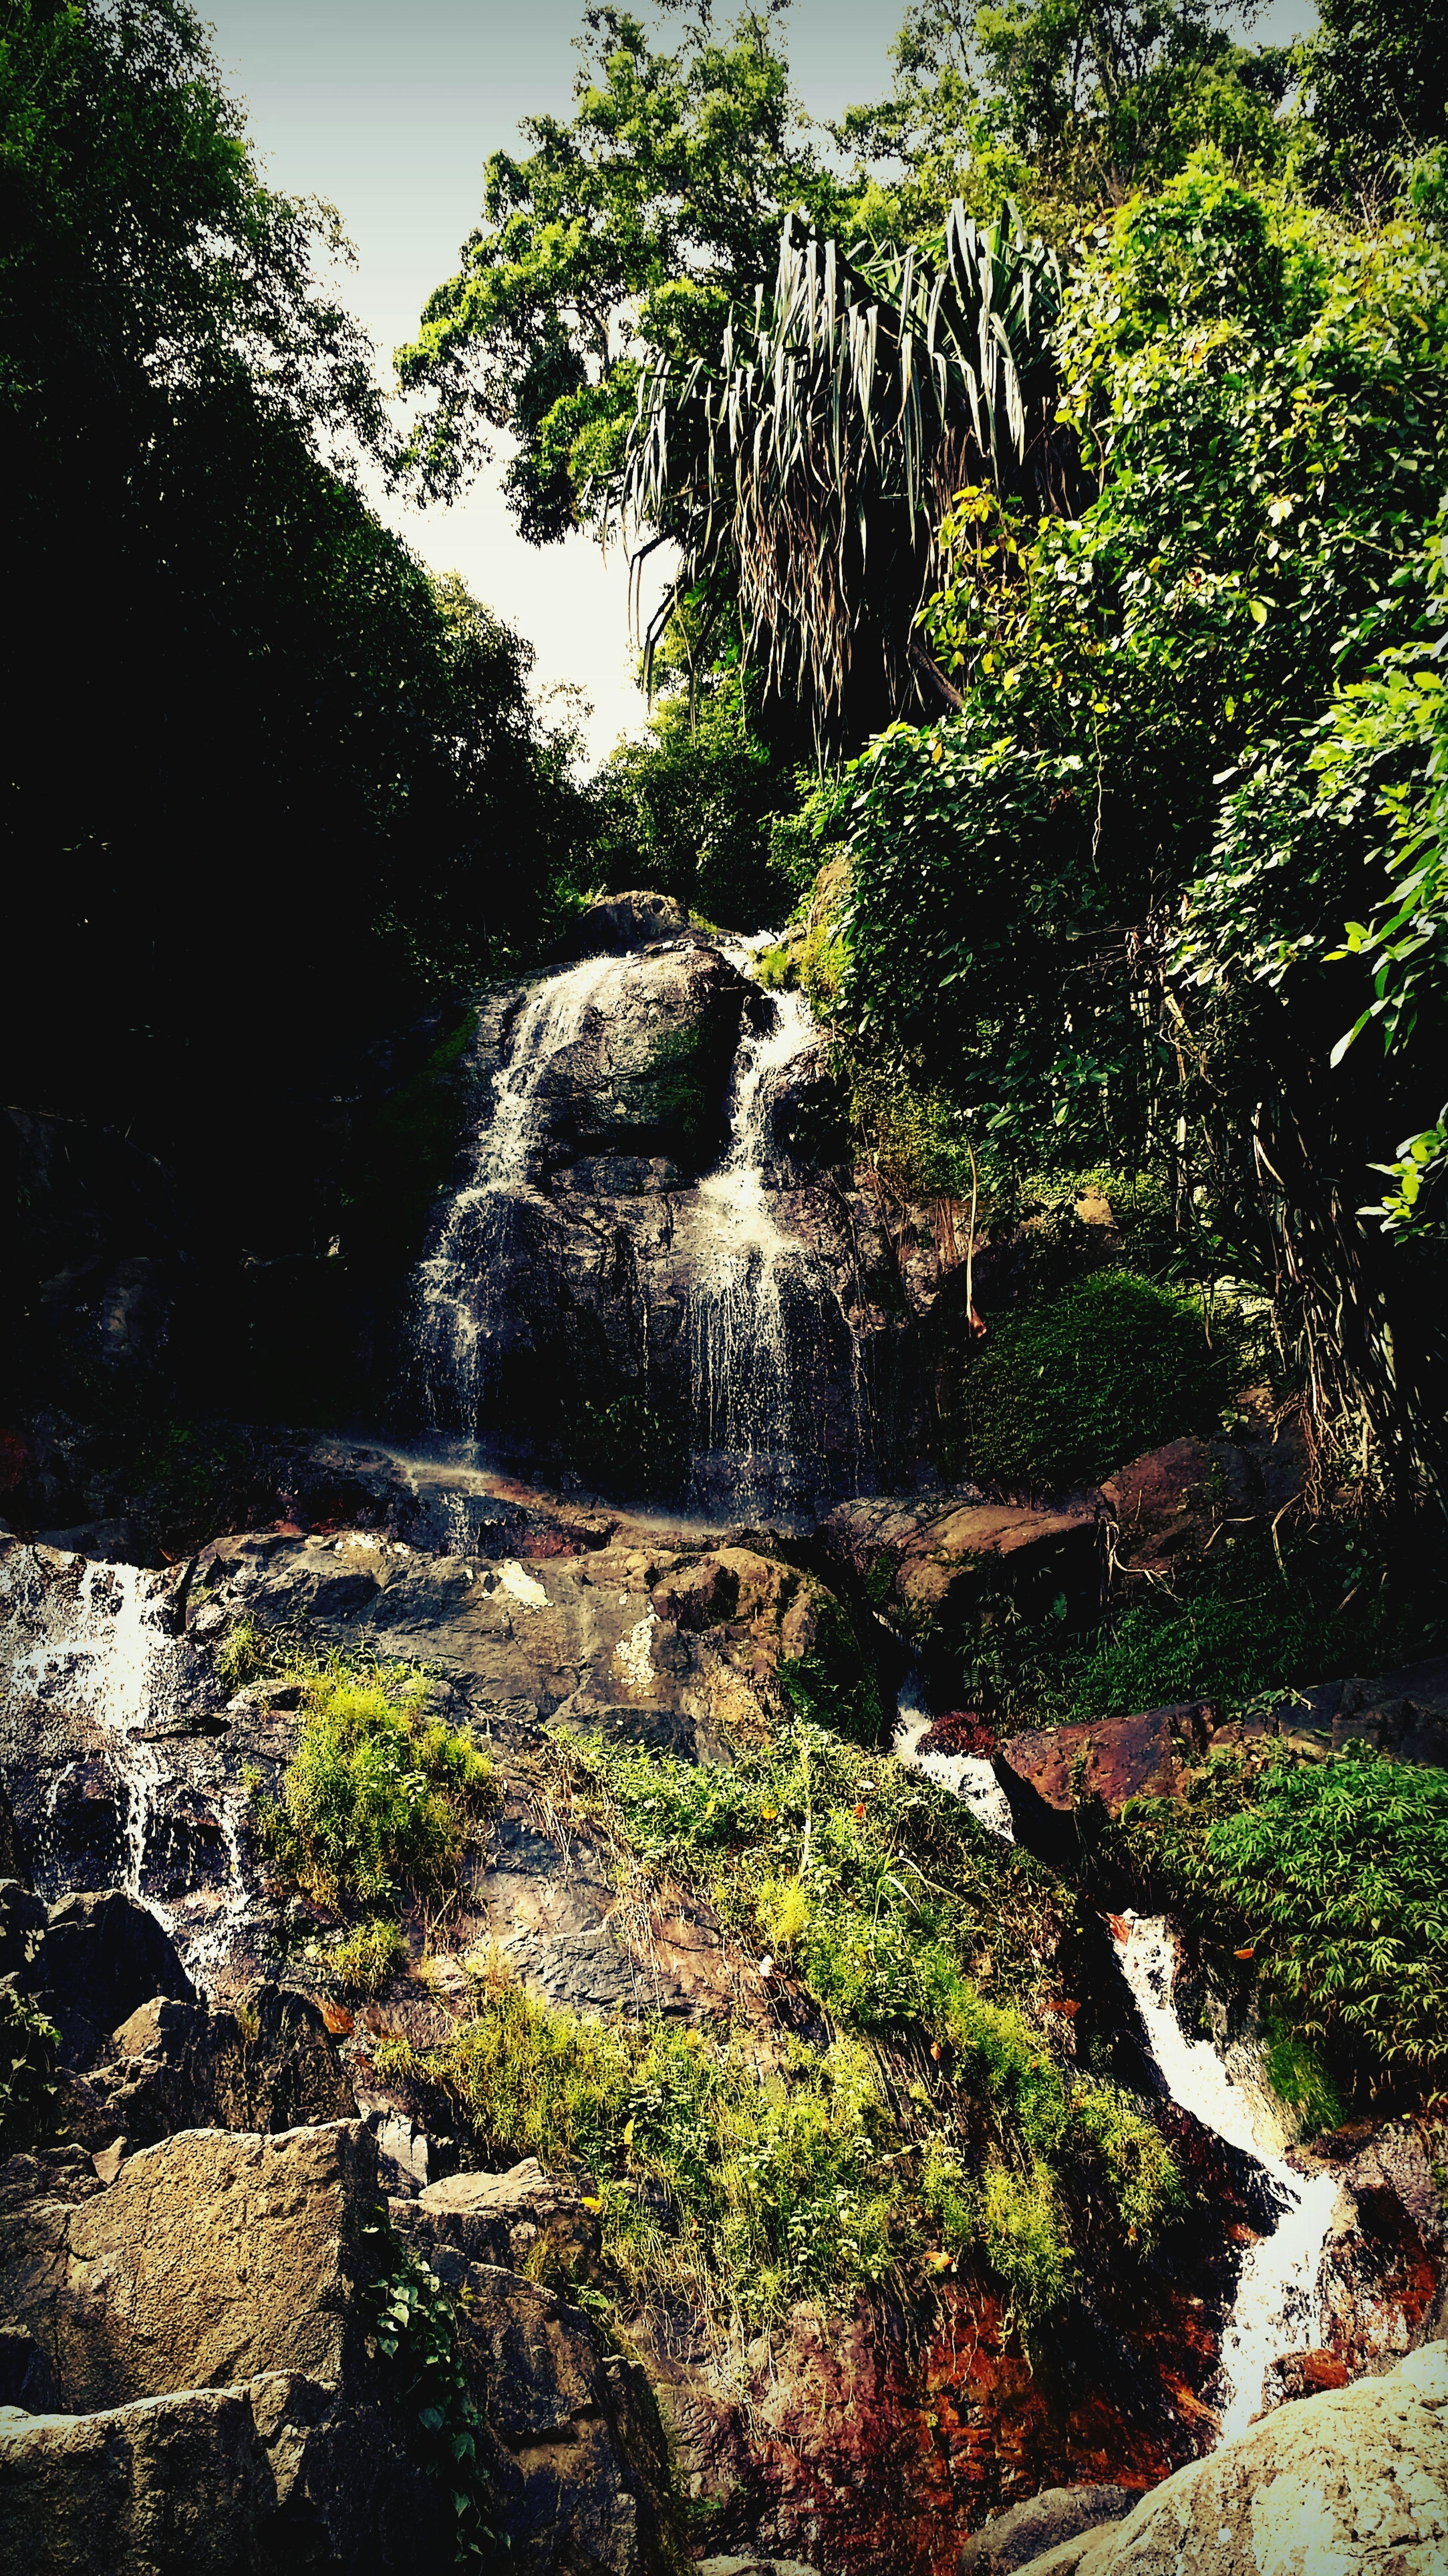 Waterfall Enjoying Nature Nature_collection Beautiful Koh Samui Thailand Rainforest Tracking Travelling